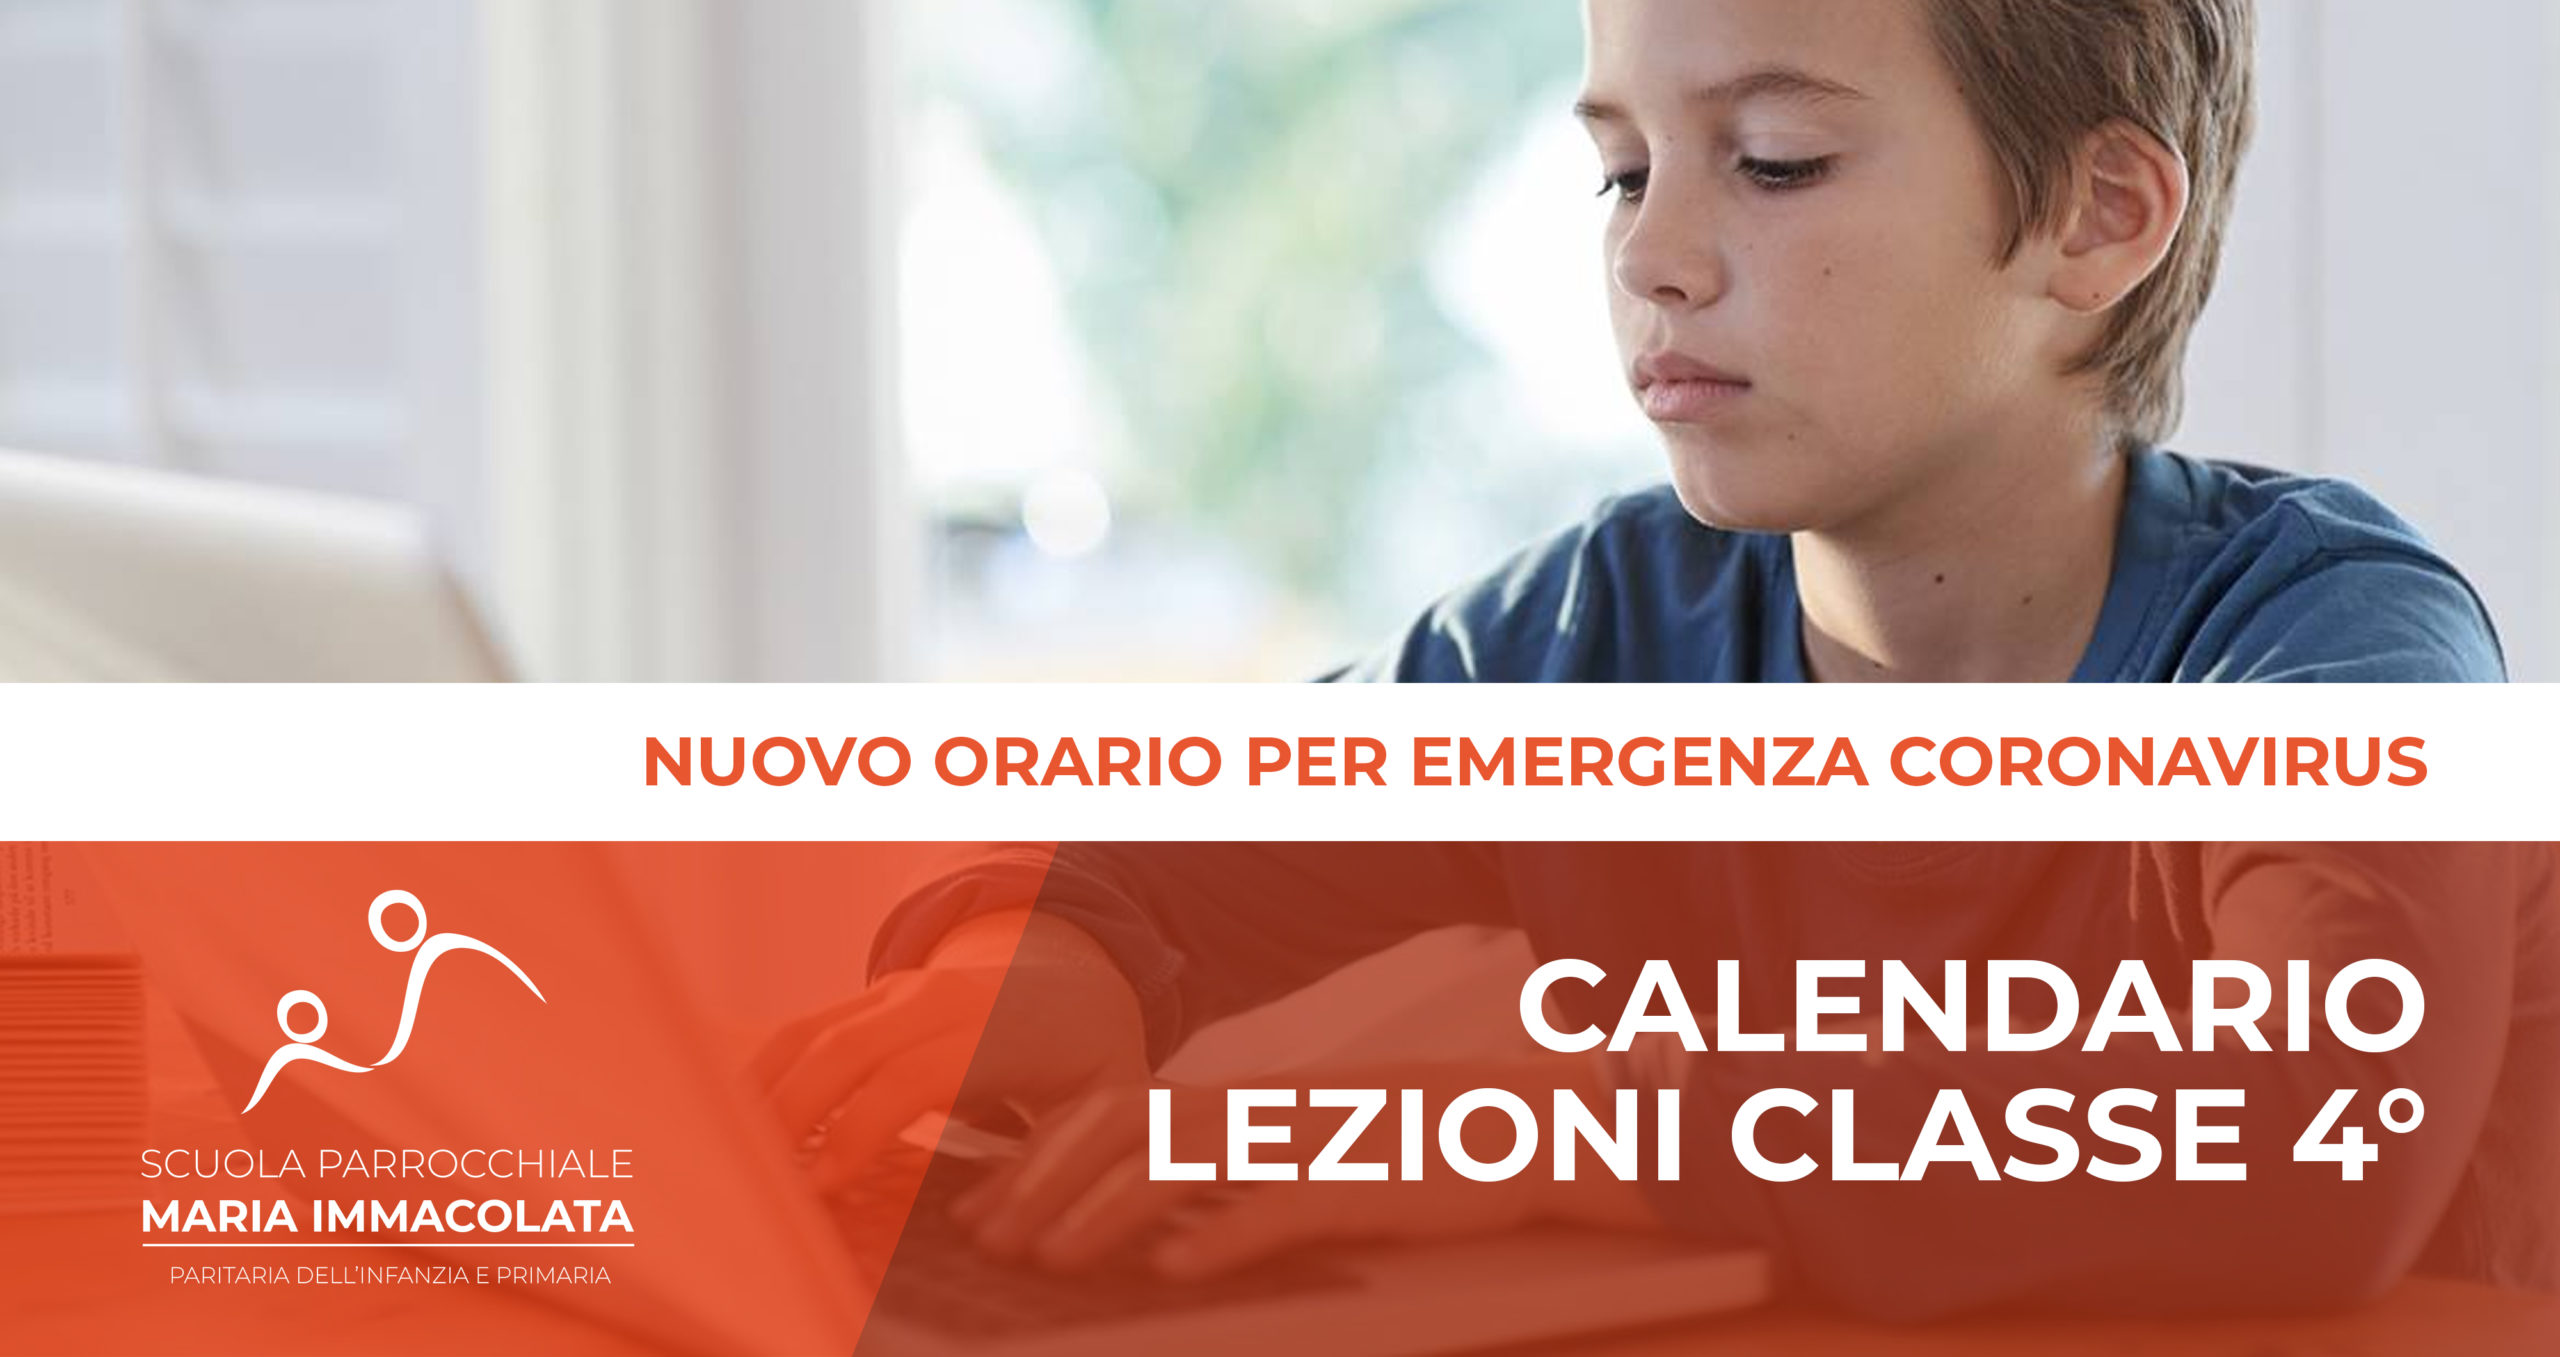 Calendario lezioni durante l'Emergenza Coronavirus – Classe 4